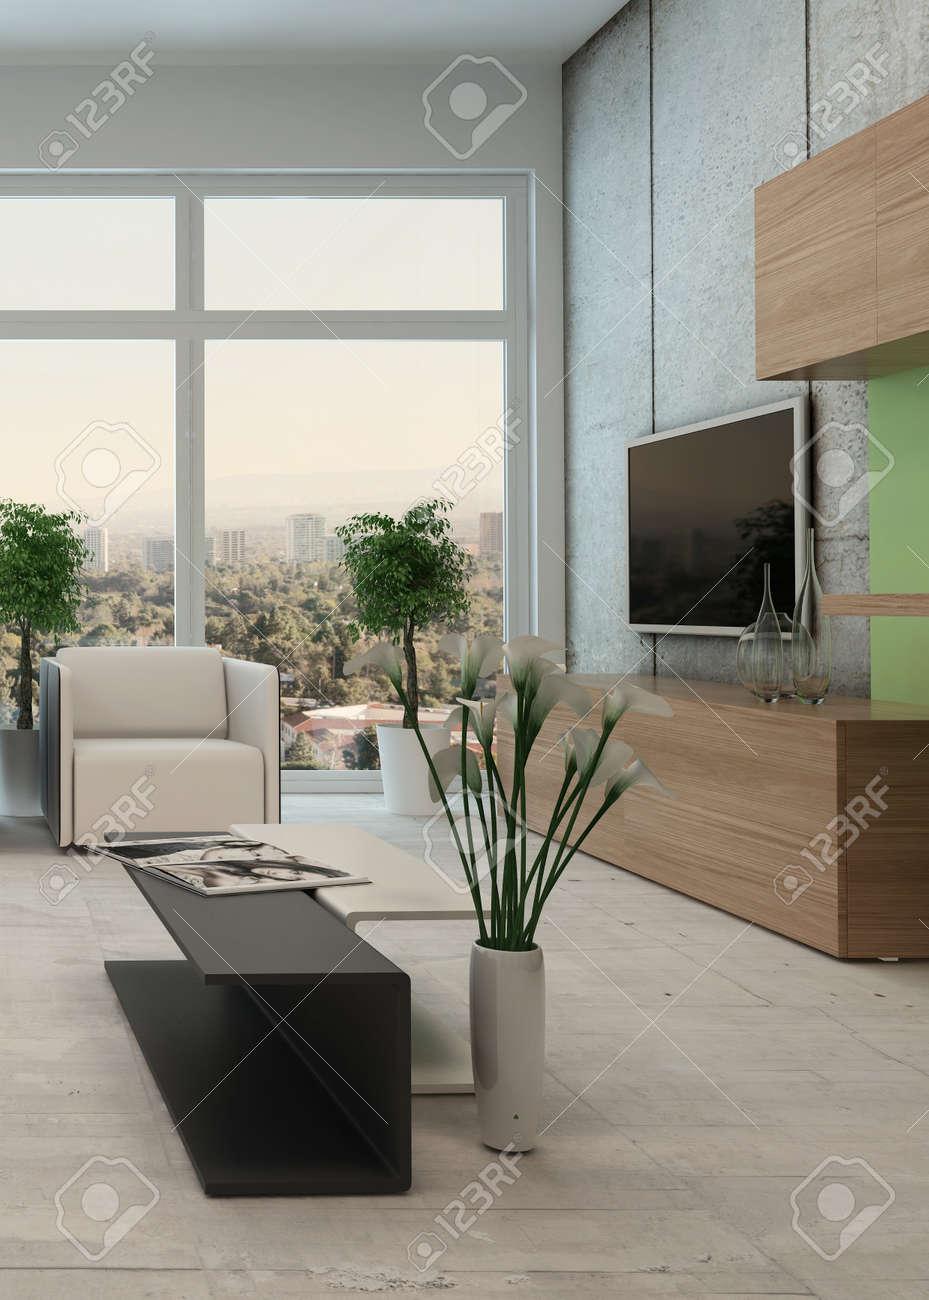 Licht, Fris Modern Appartement Woonkamer Interieur Met Een Vloer ...